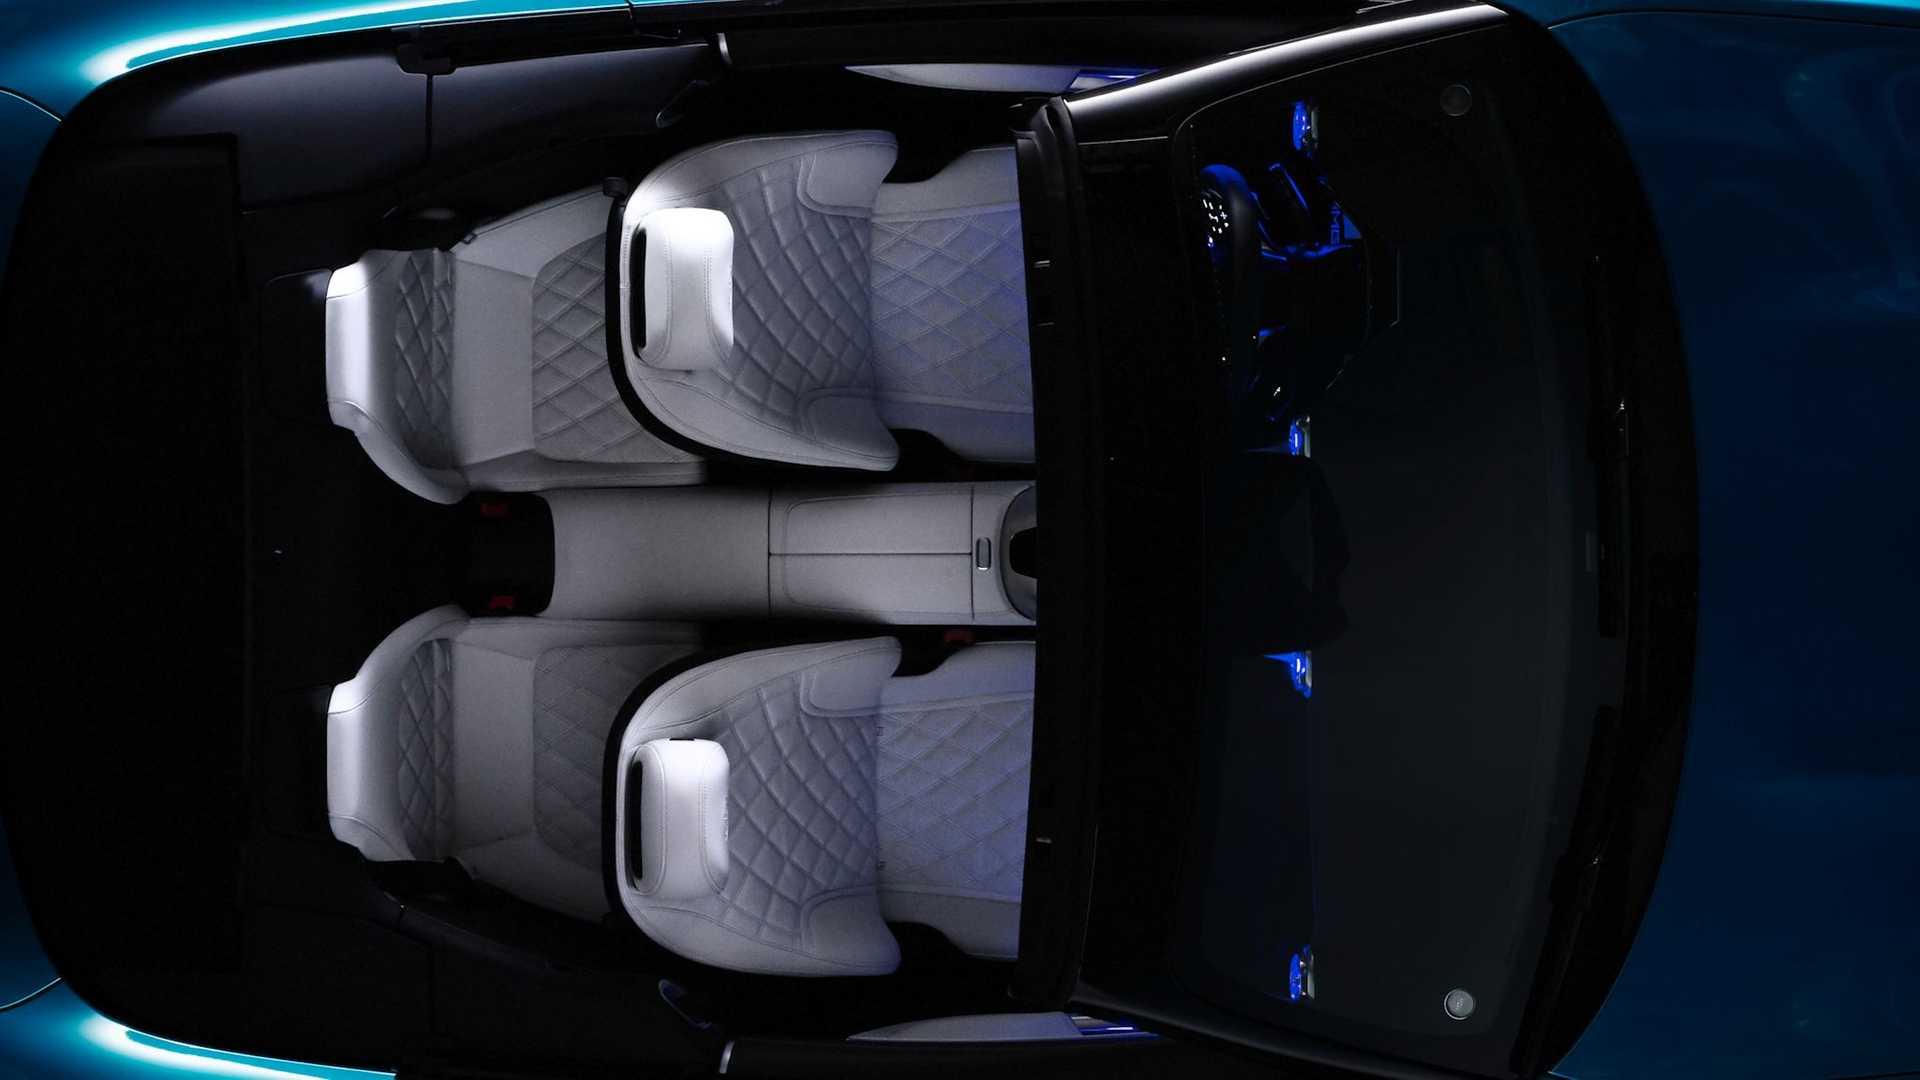 2022-mercedes-amg-sl-interior9.jpeg